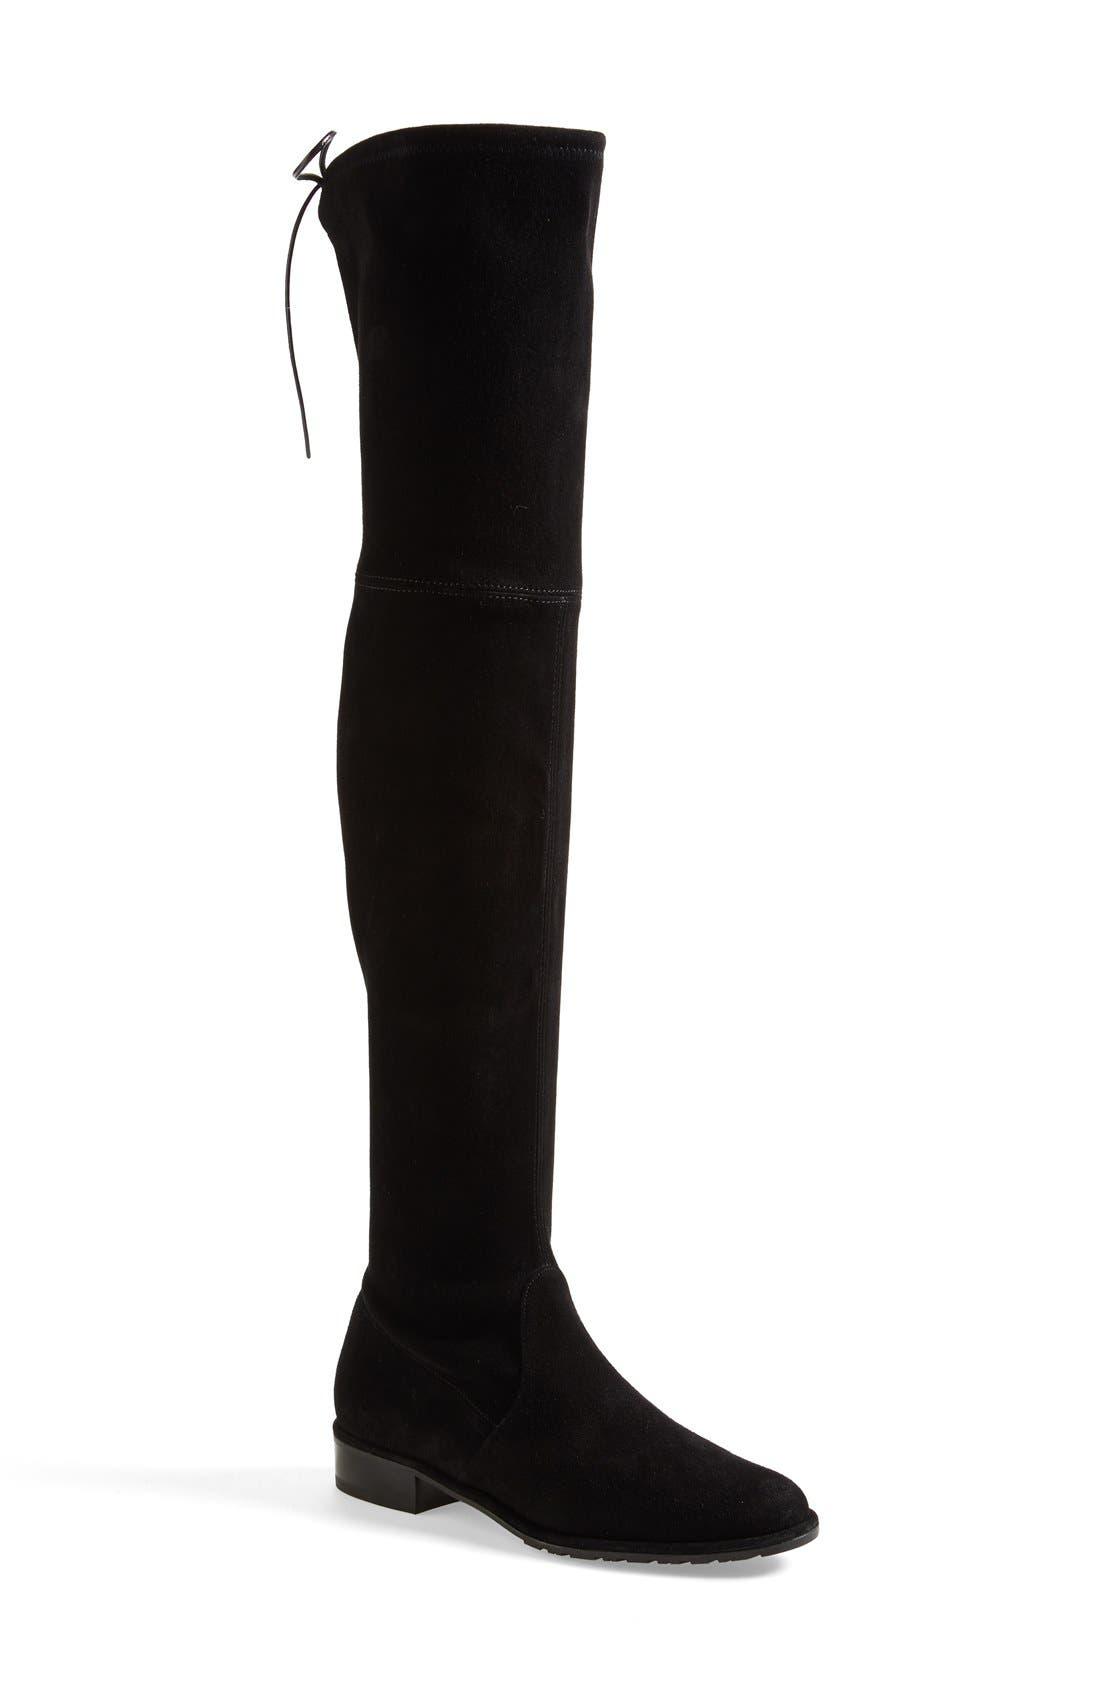 Buy Womens Stuart Weitzman 'lowland' Boots Shops